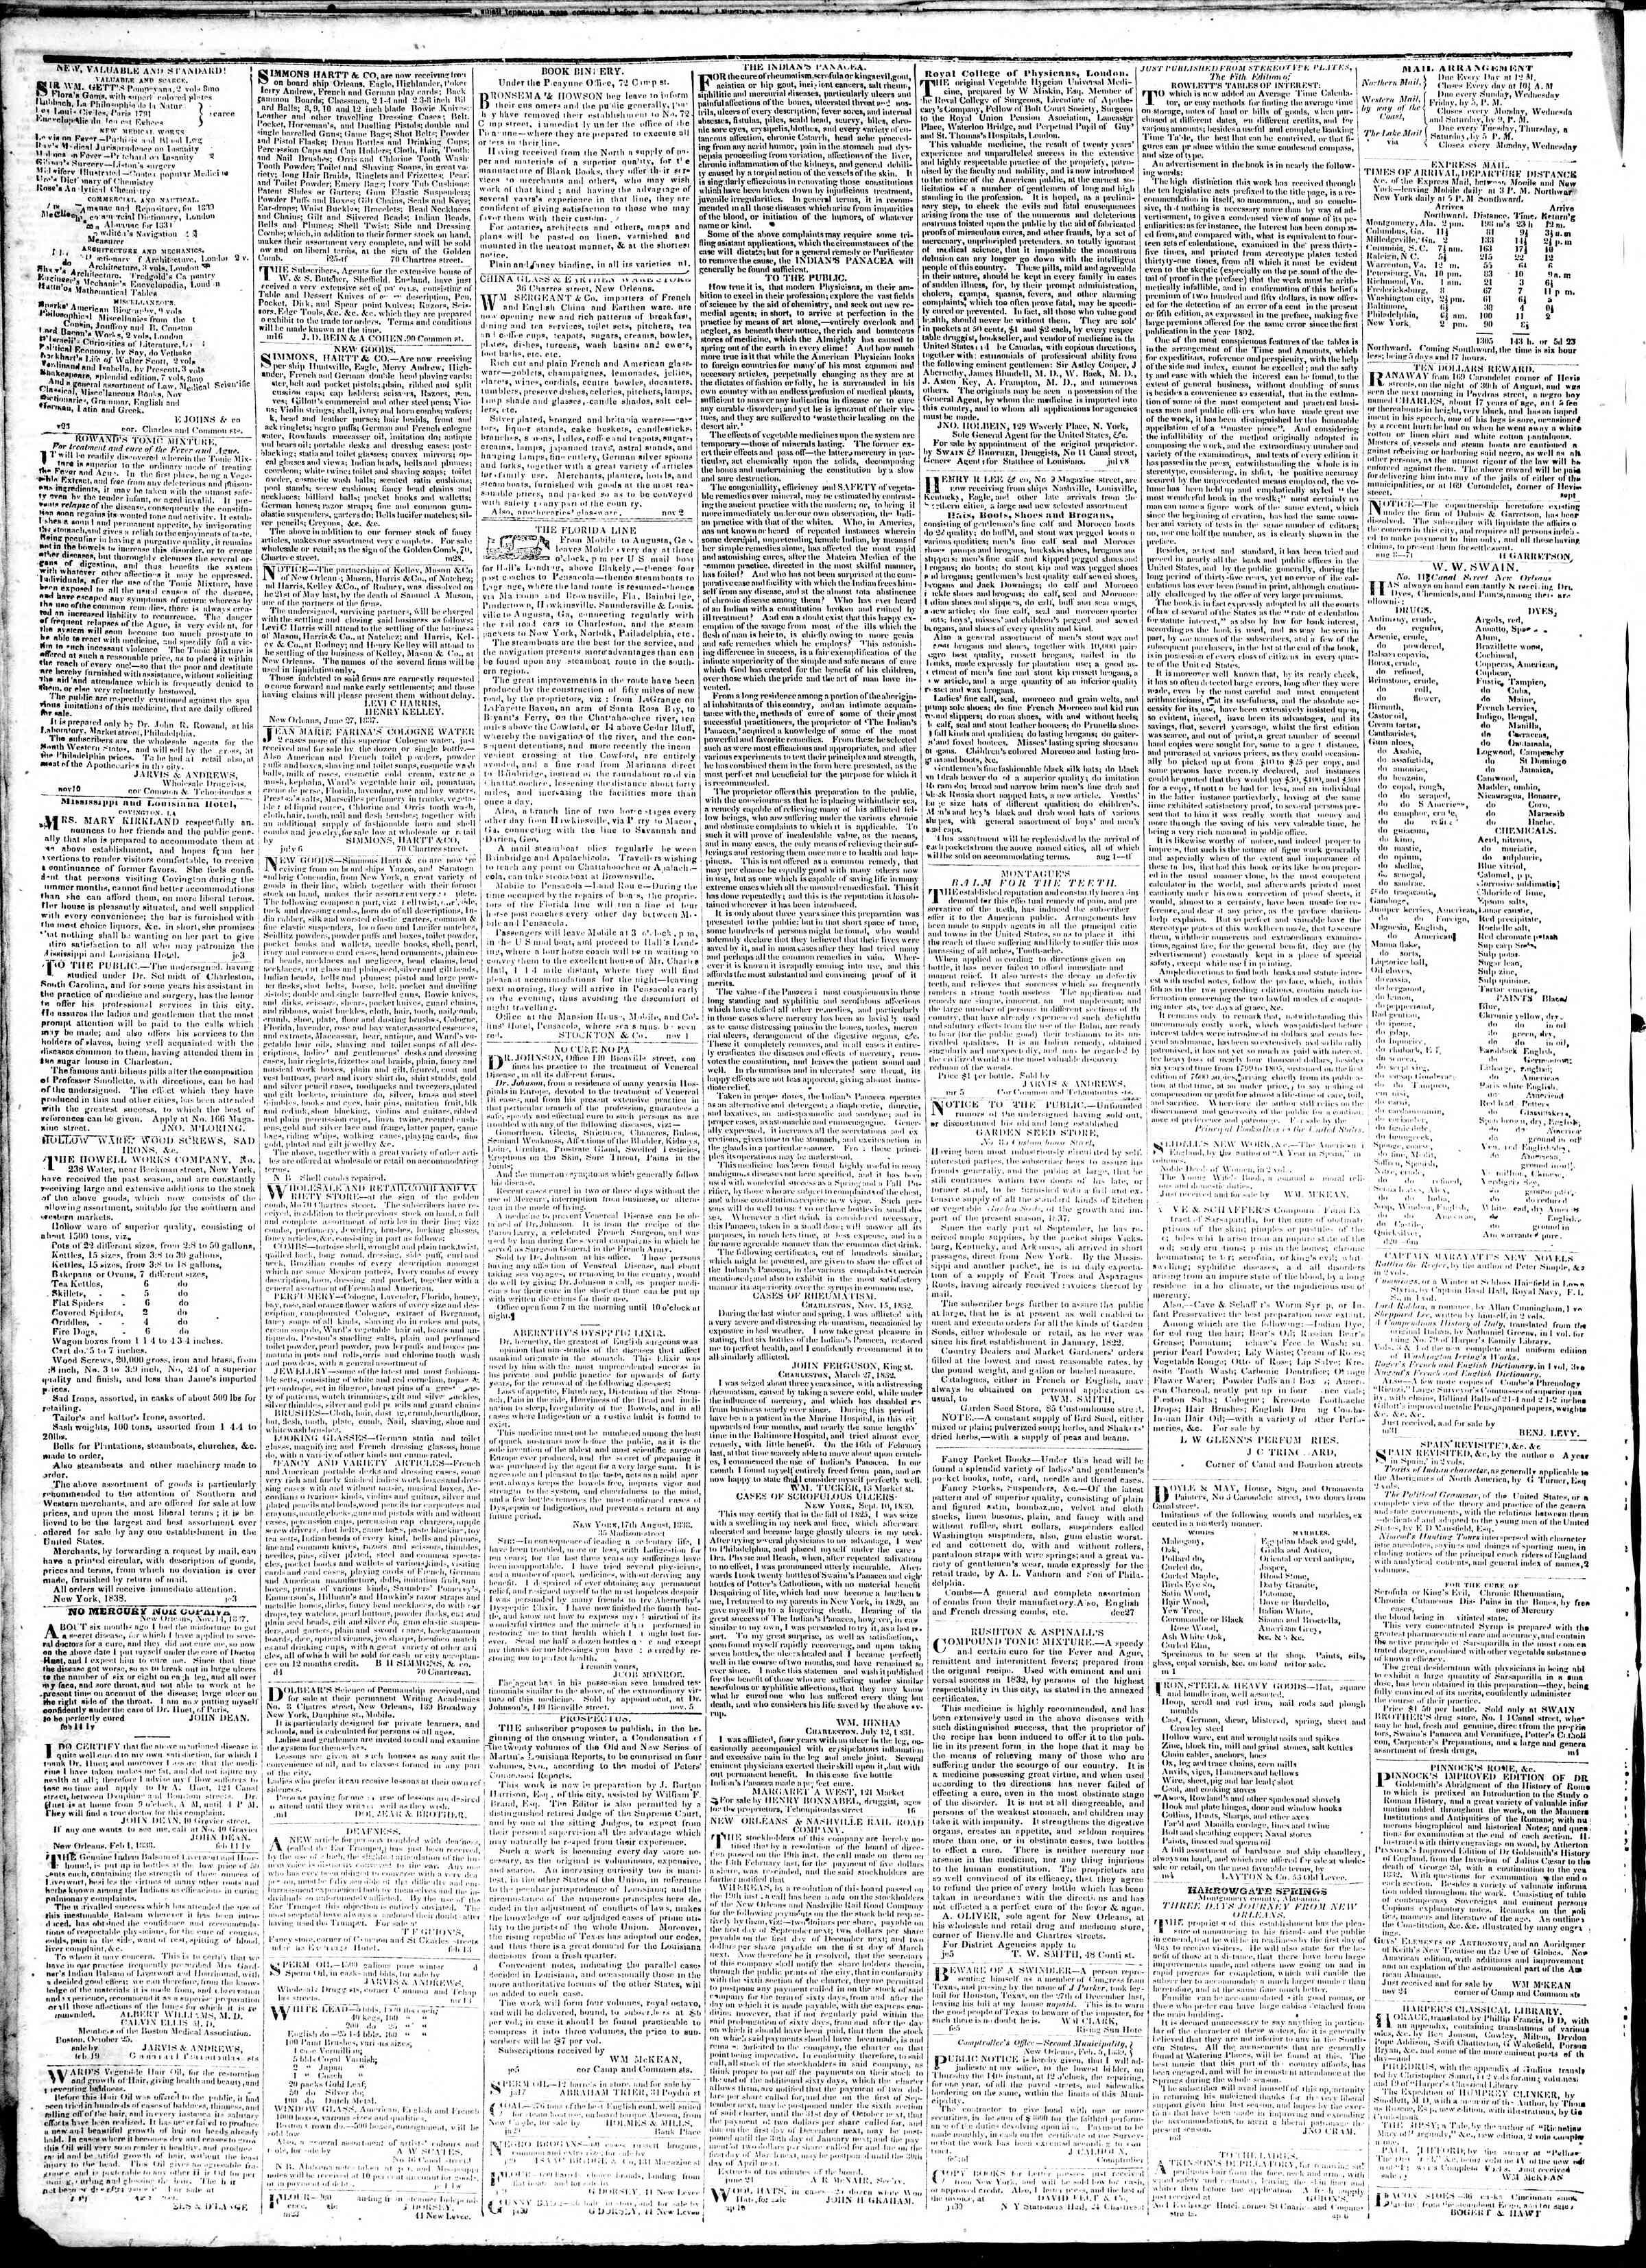 February 11, 1839 Tarihli True American Gazetesi Sayfa 4